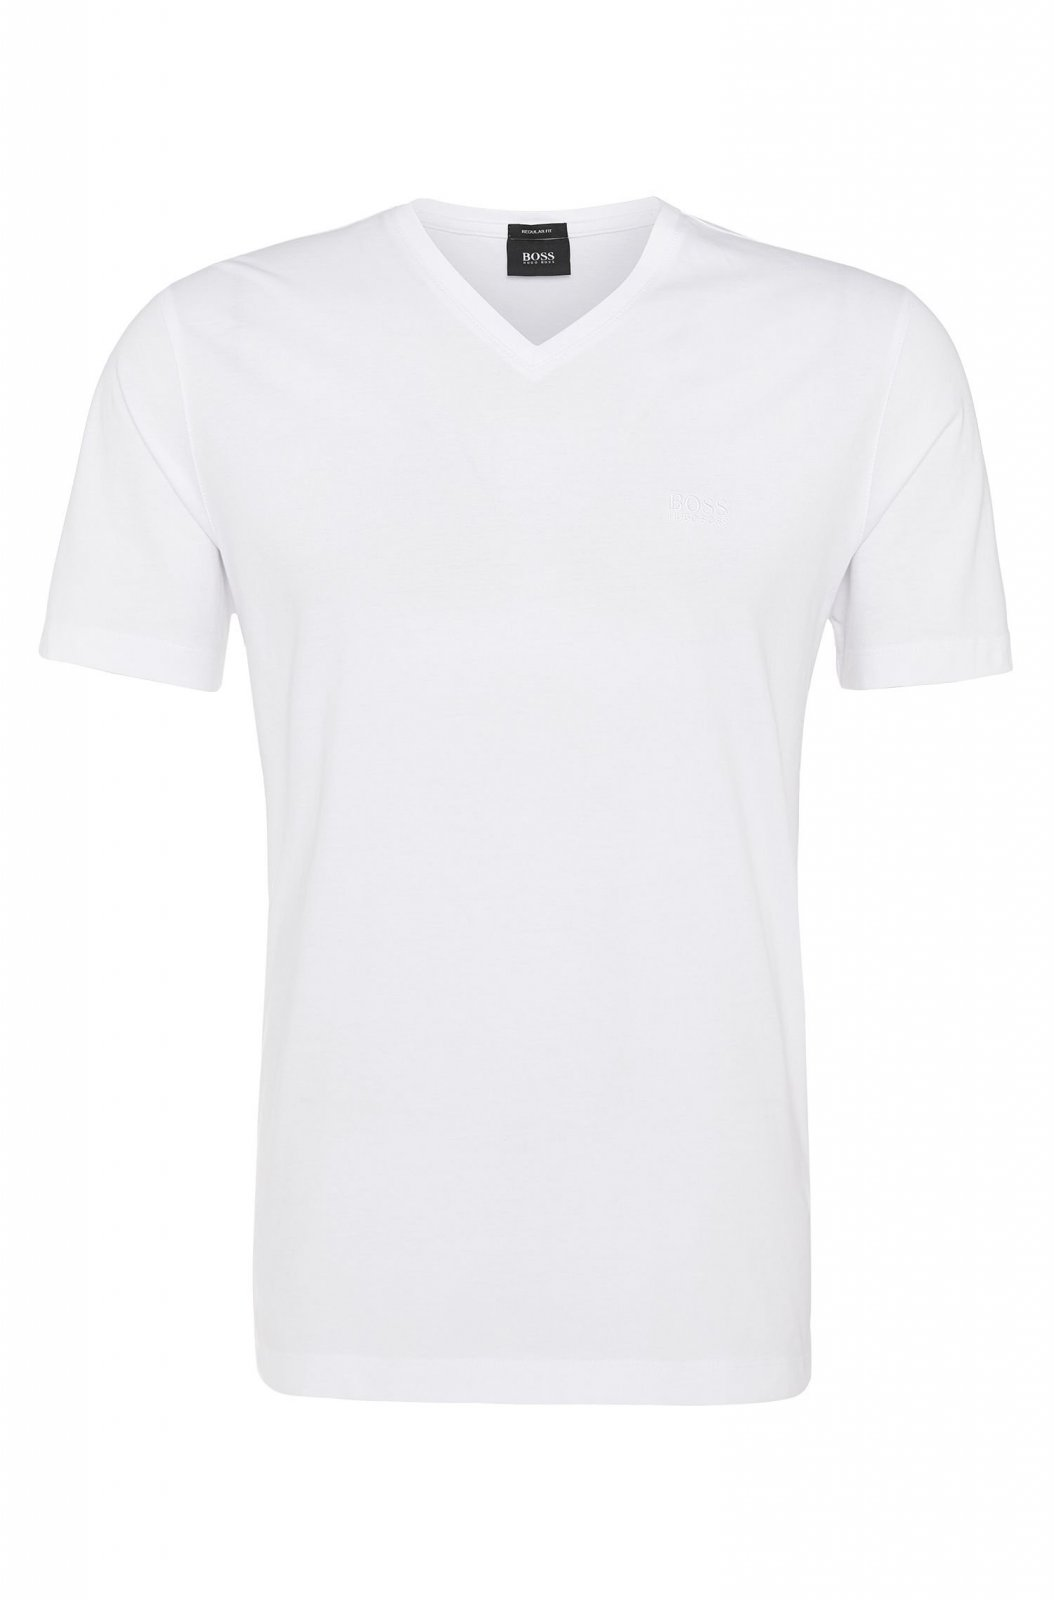 hugo boss lot 2 tee shirt hugo boss blanc 50247175 t. Black Bedroom Furniture Sets. Home Design Ideas